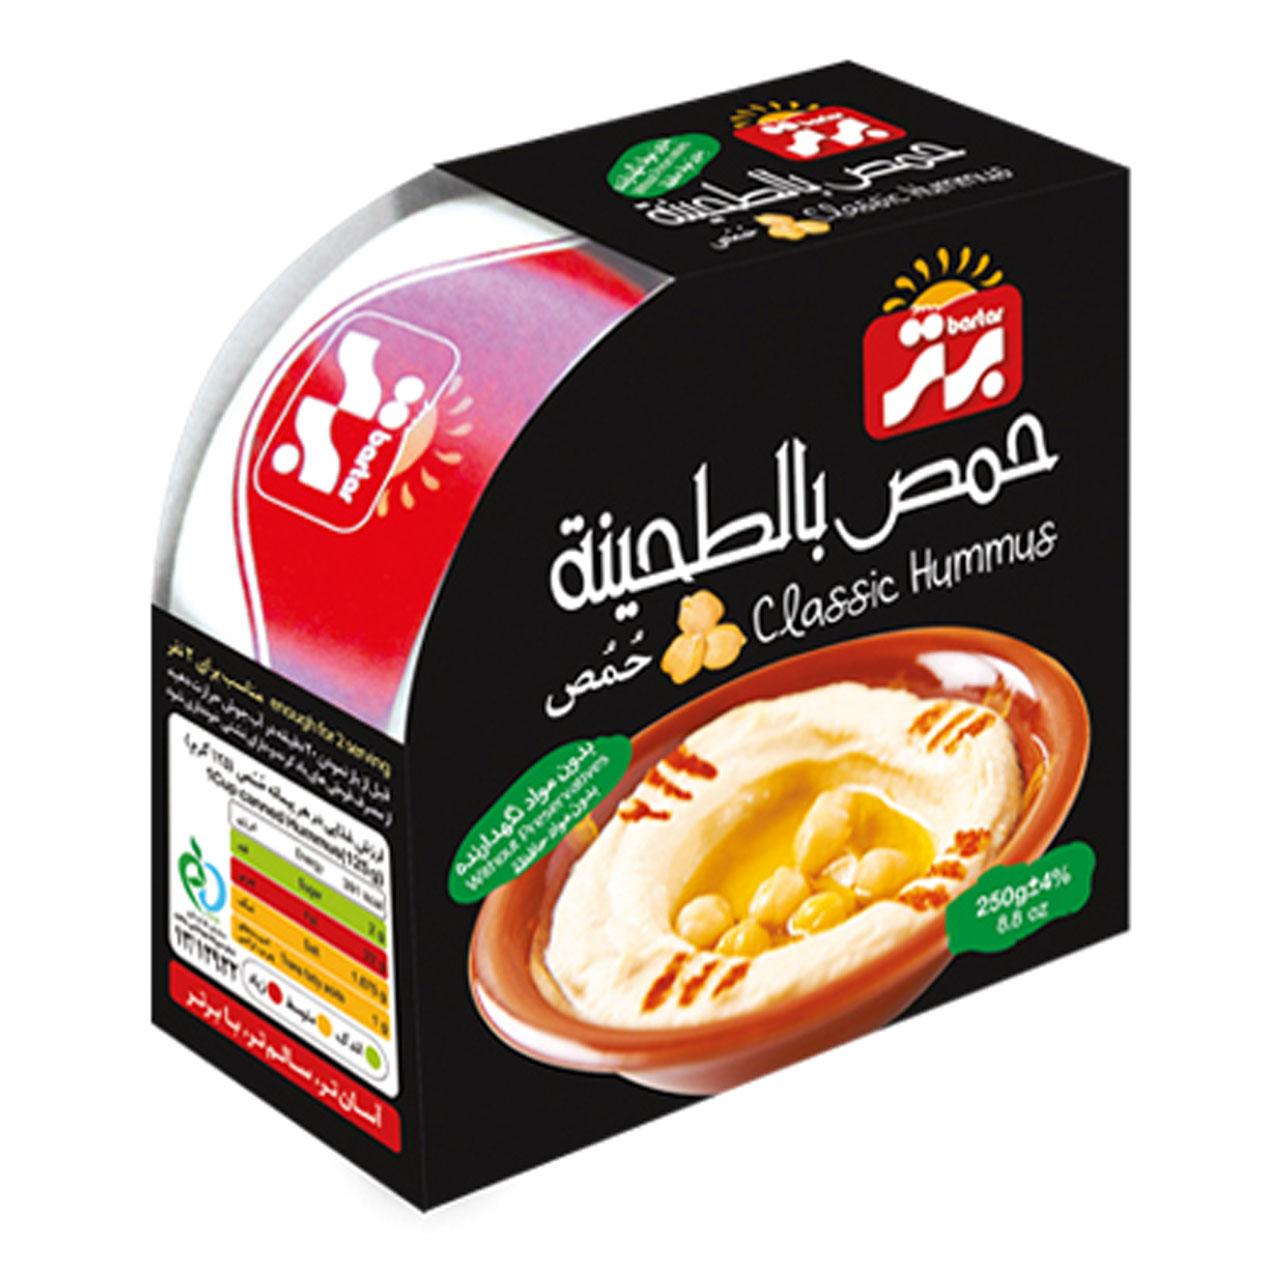 کنسرو حمص برتر - 250 گرم